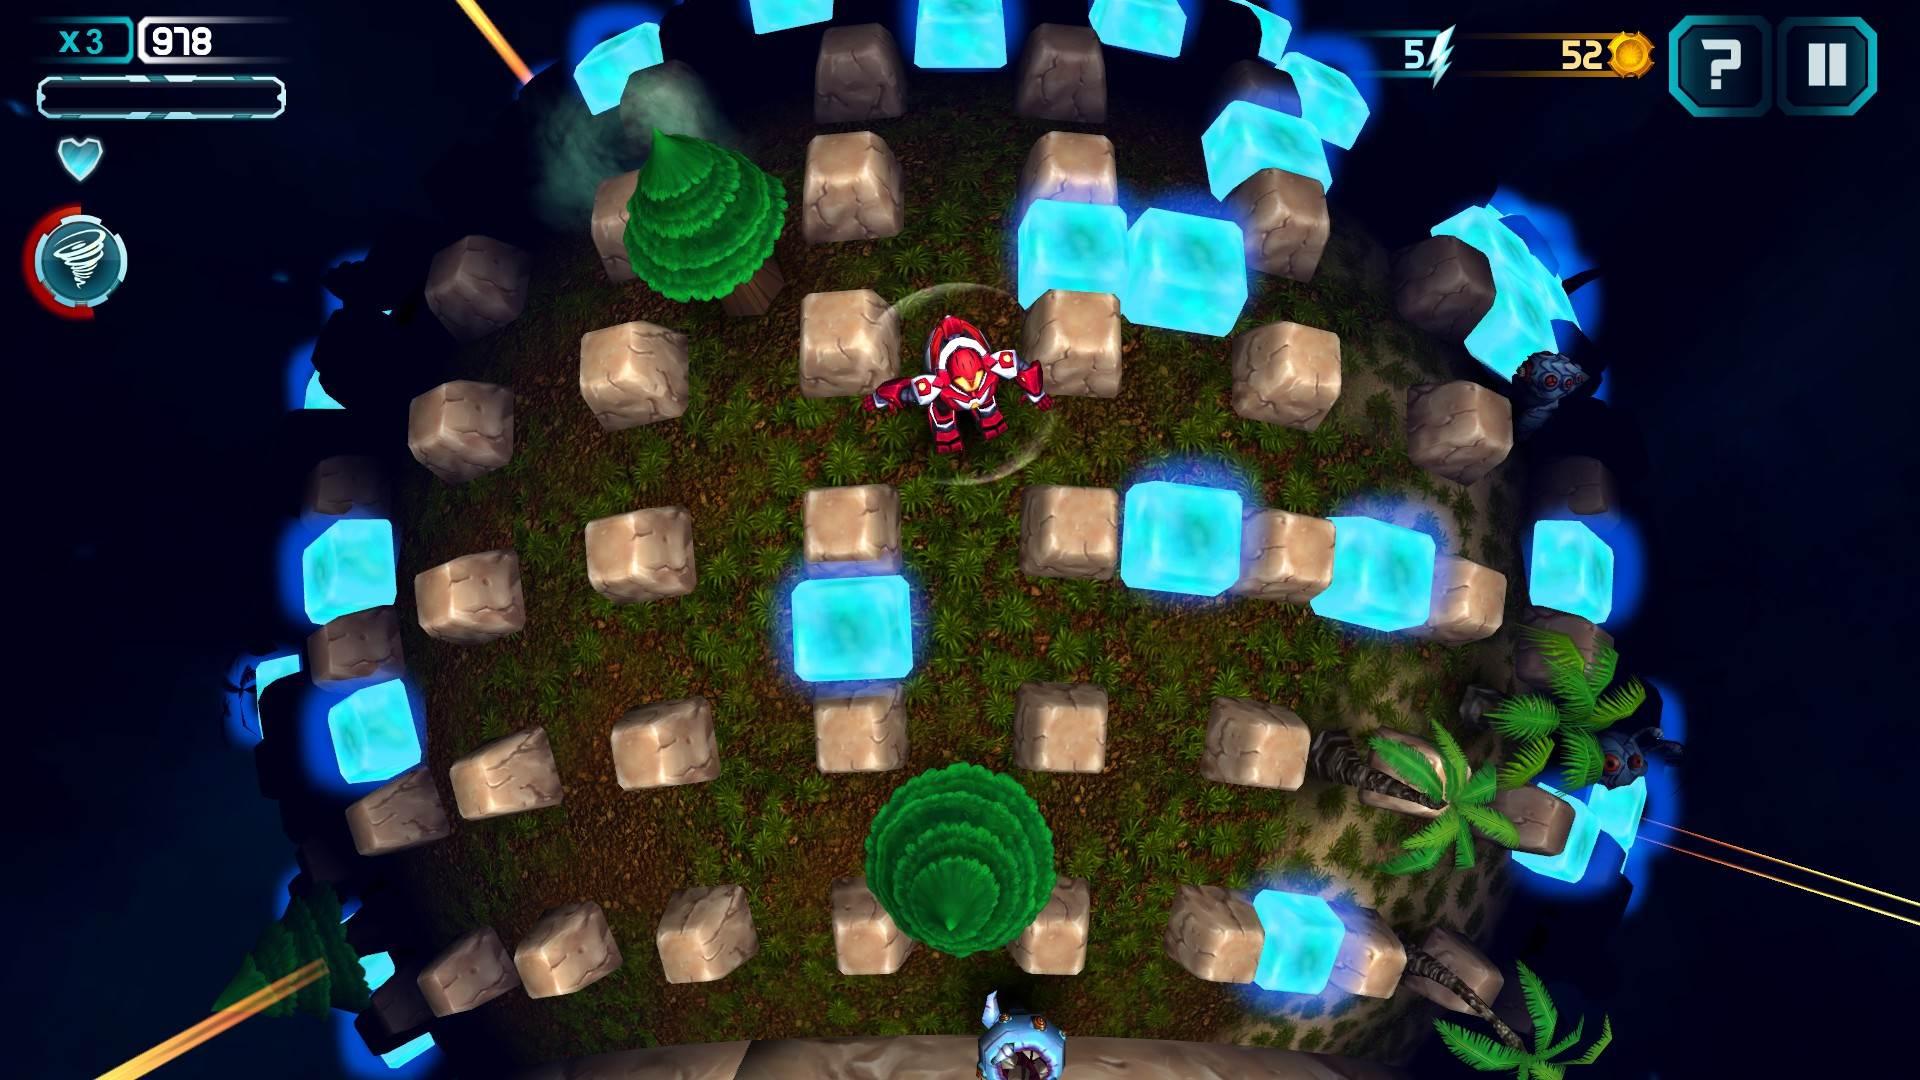 BomberZone-Review-Screenshot-02